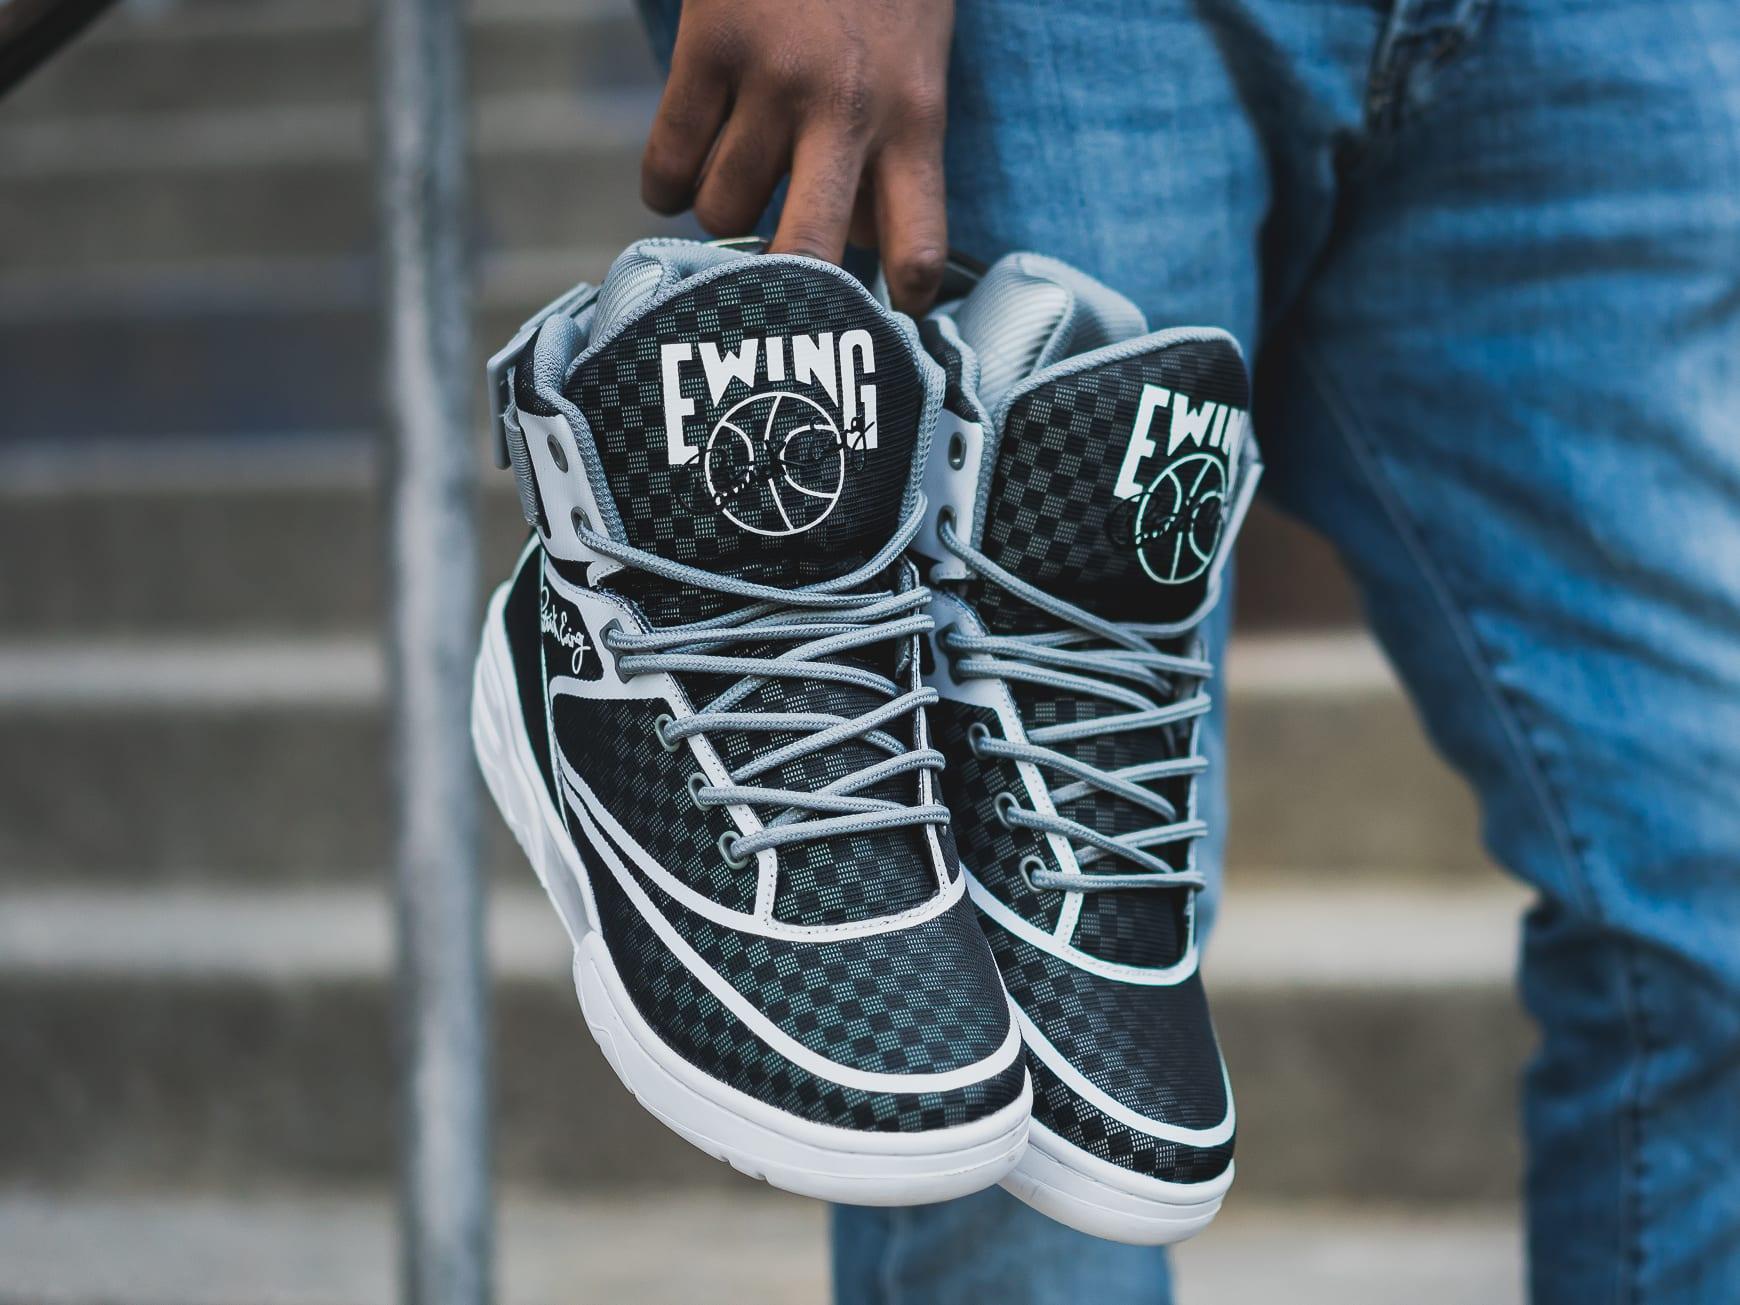 2 Chainz x Ewing 33 Hi Release Date